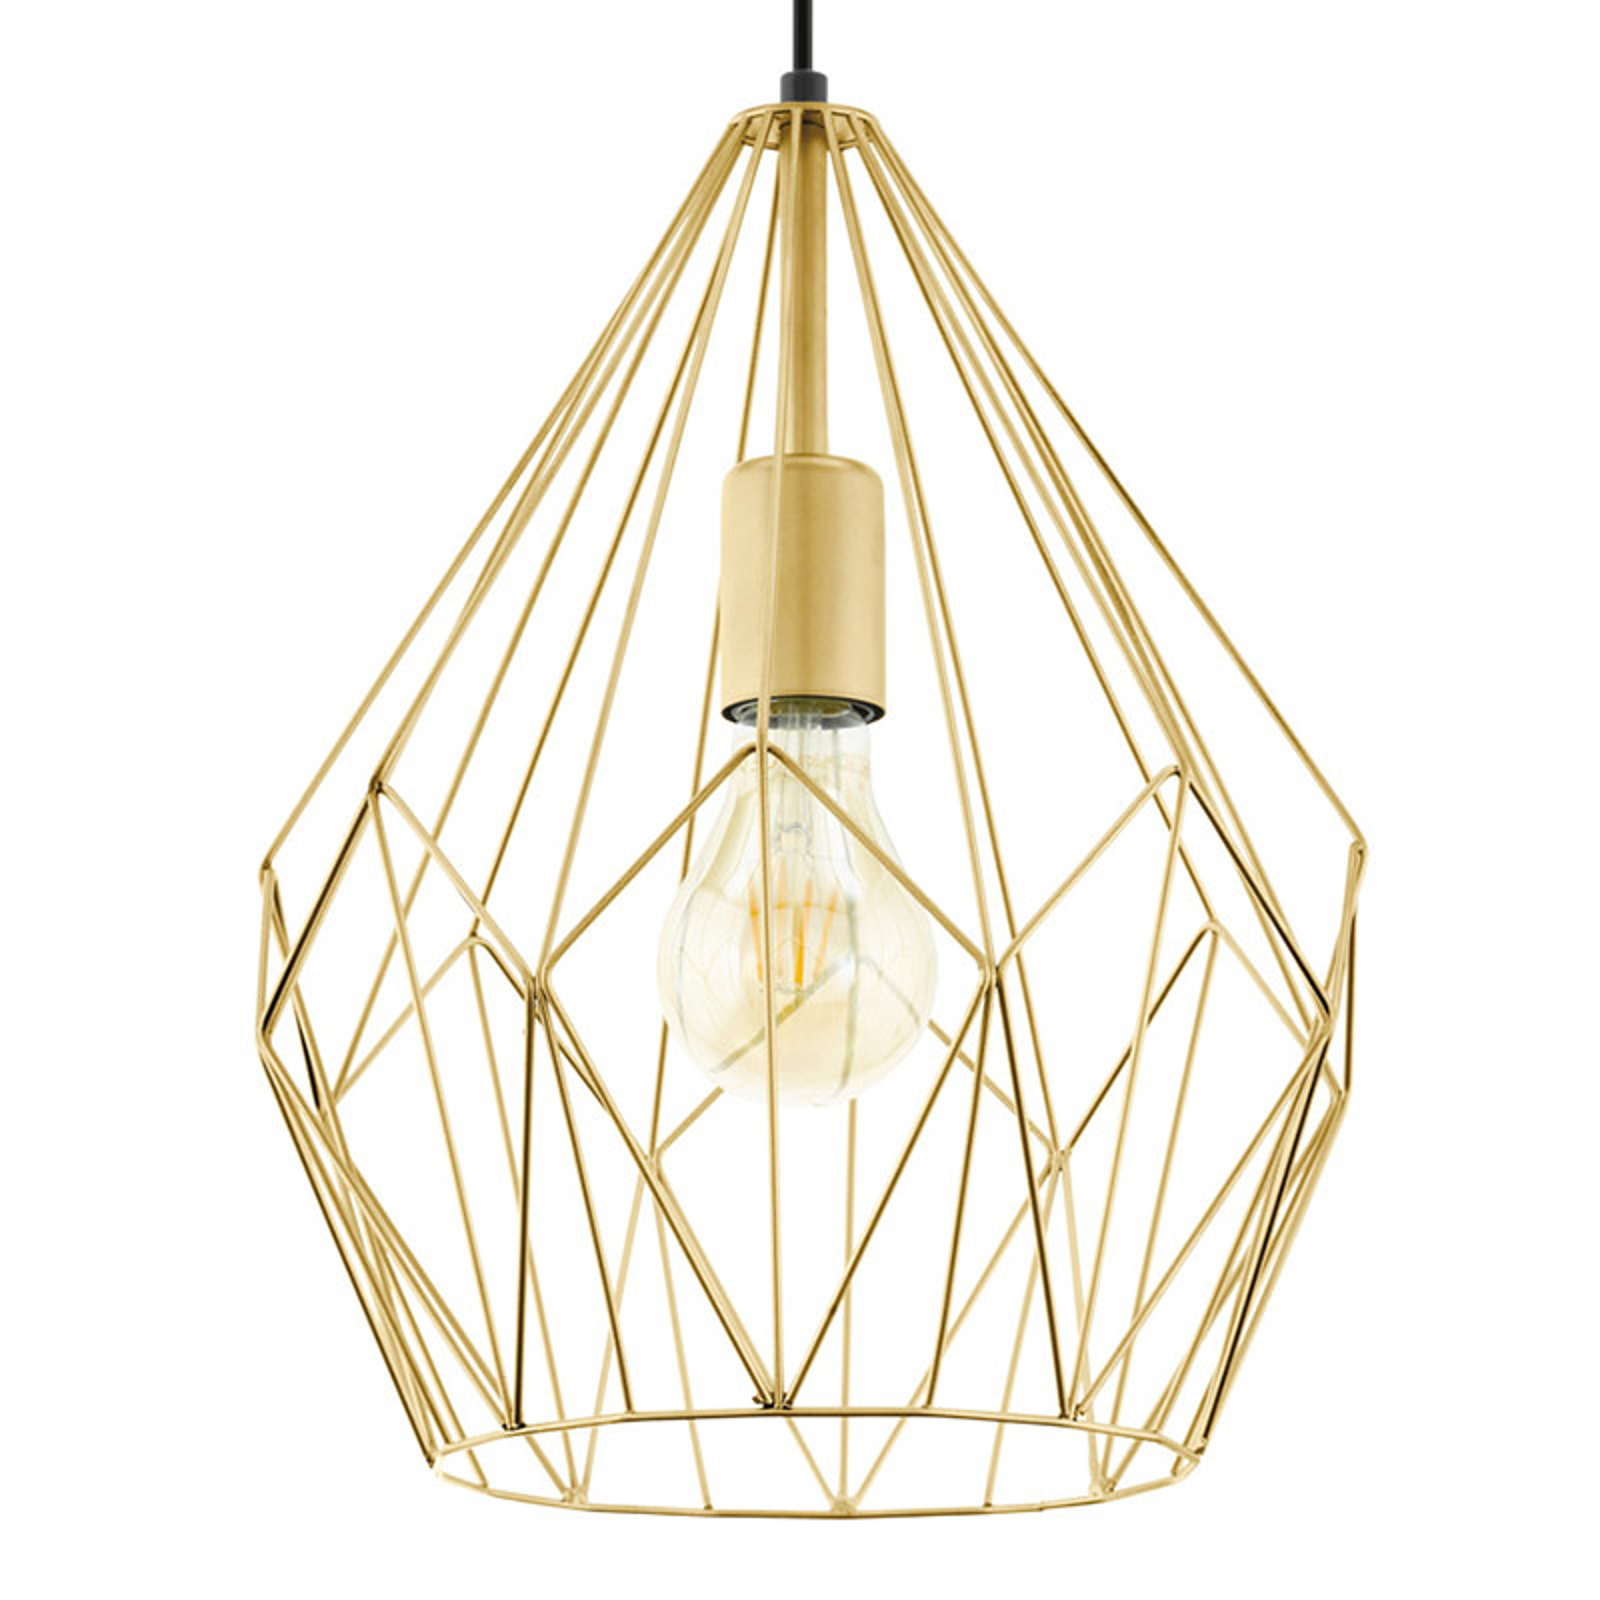 Hanglamp Carlton met kooikap, goudkleurig